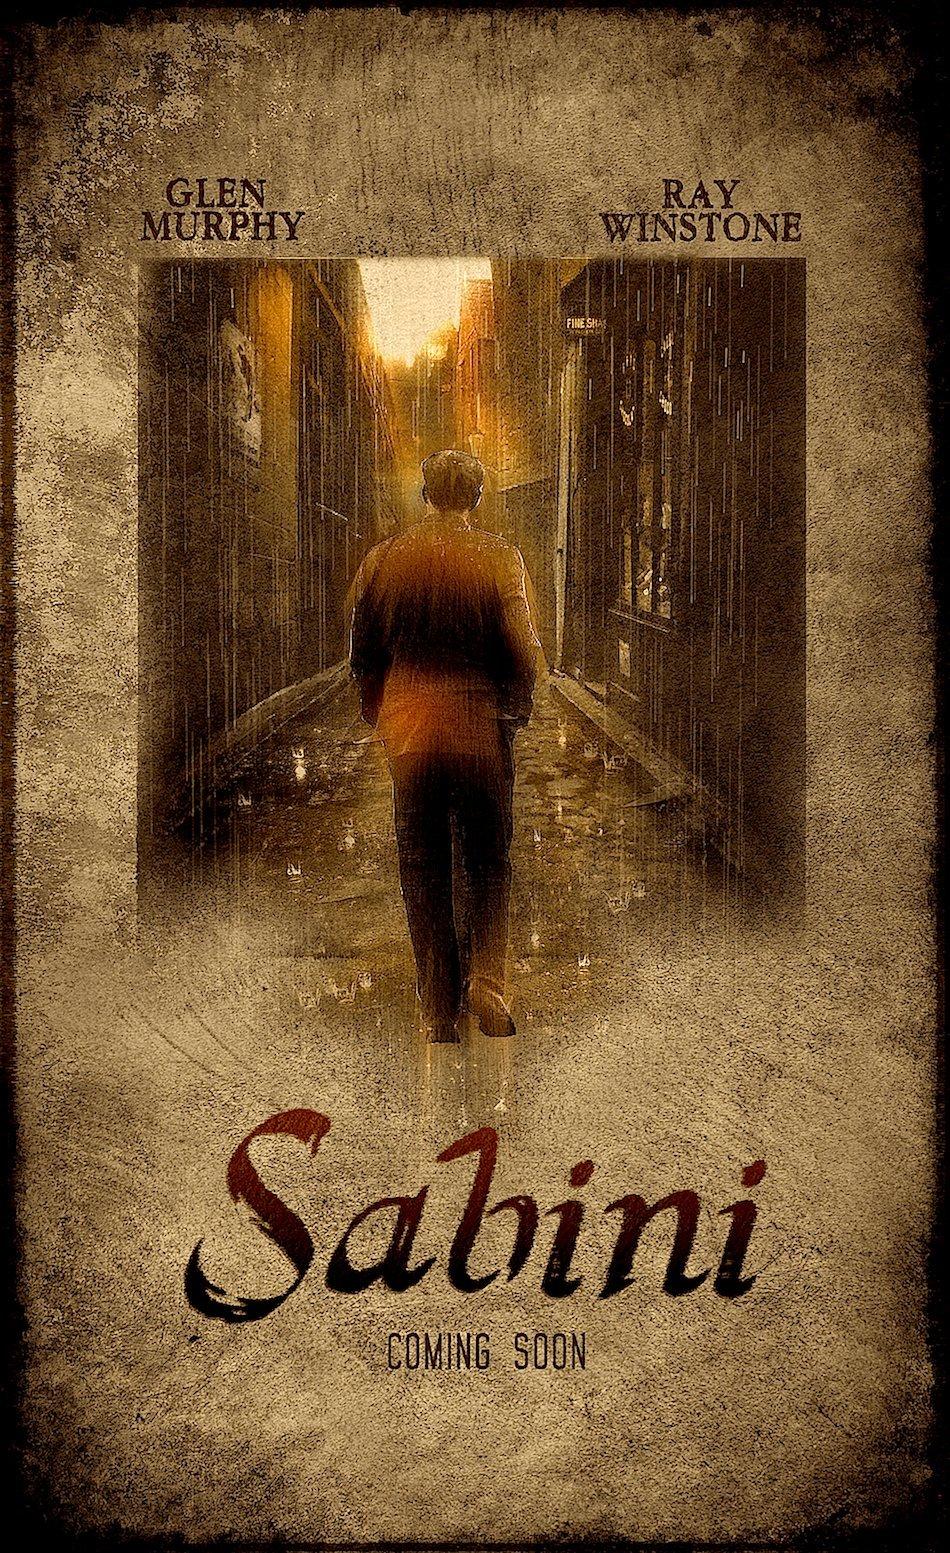 Sabini - IMDb